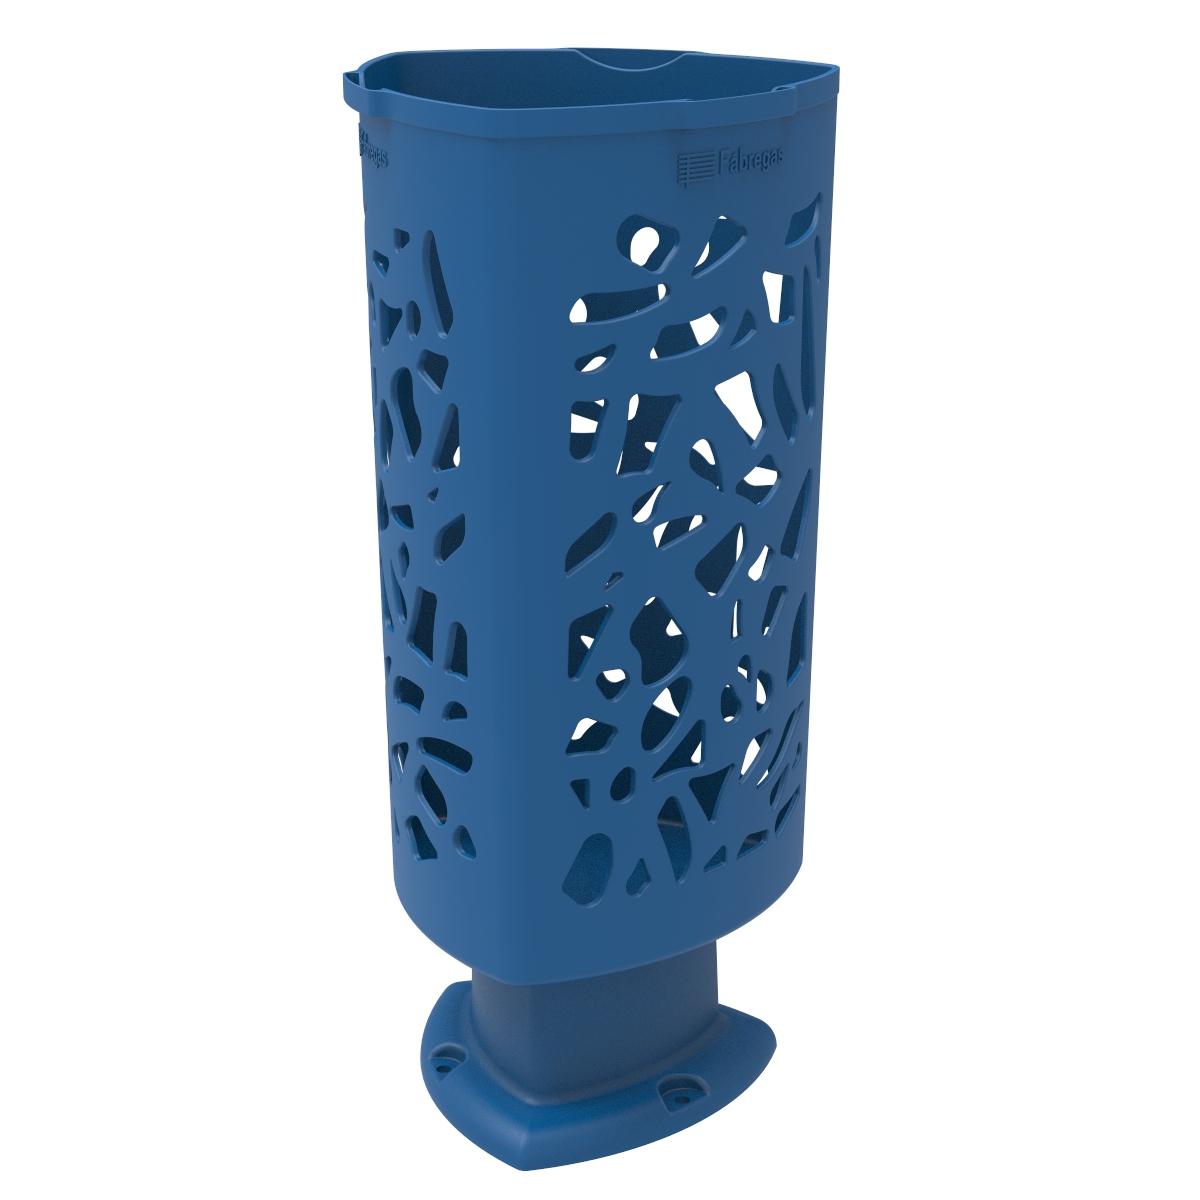 Paper bin Scuderia of Polyethylene Blue color RAL 5005 for Street